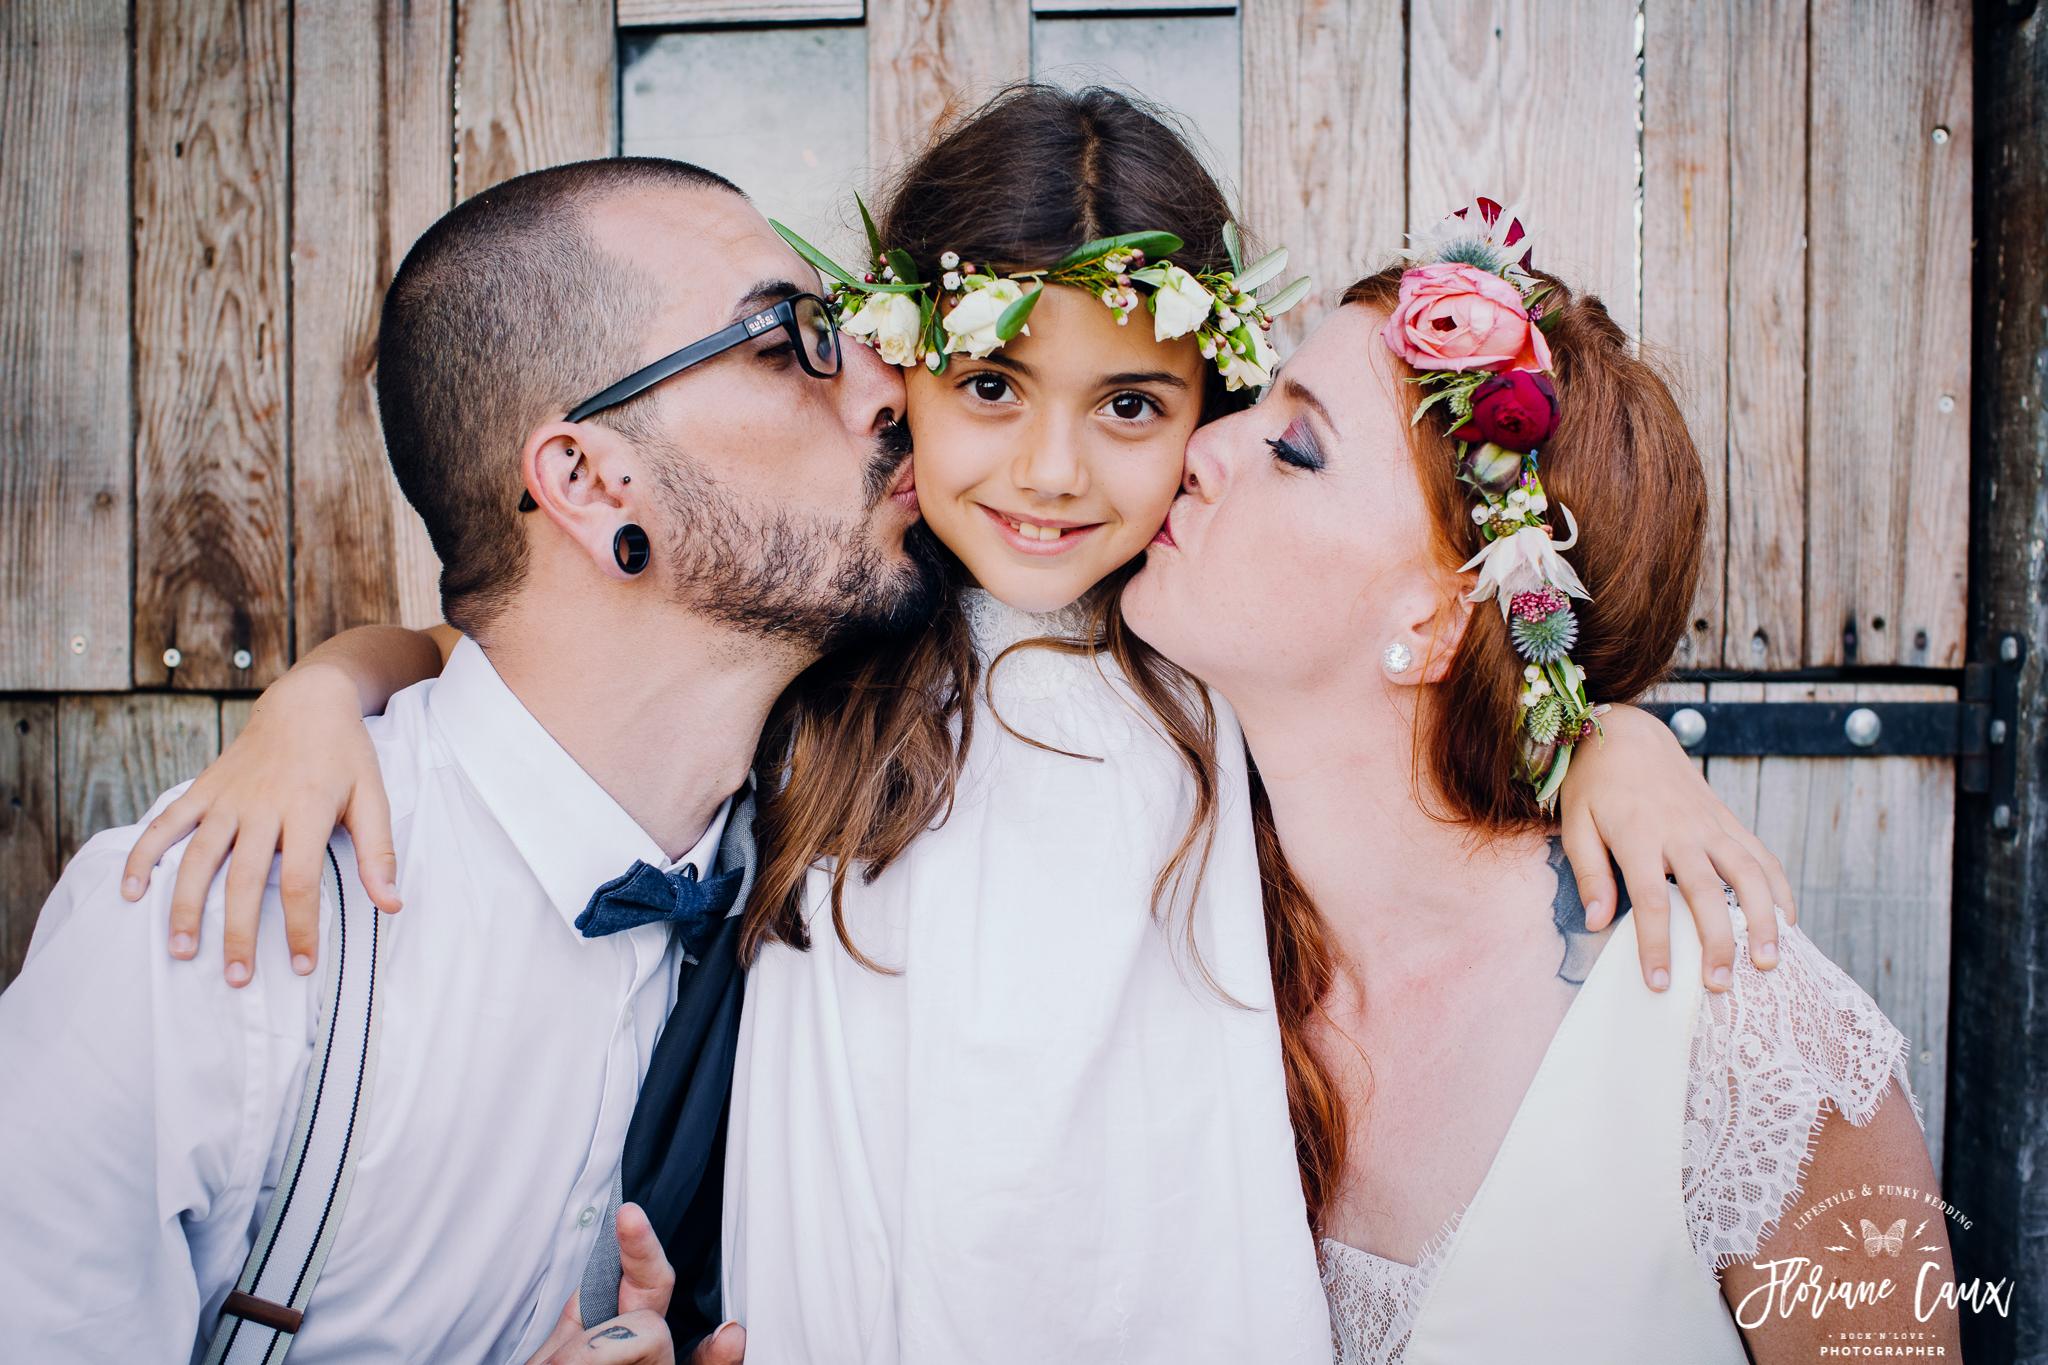 photographe-mariage-toulouse-rocknroll-maries-tatoues-floriane-caux-25